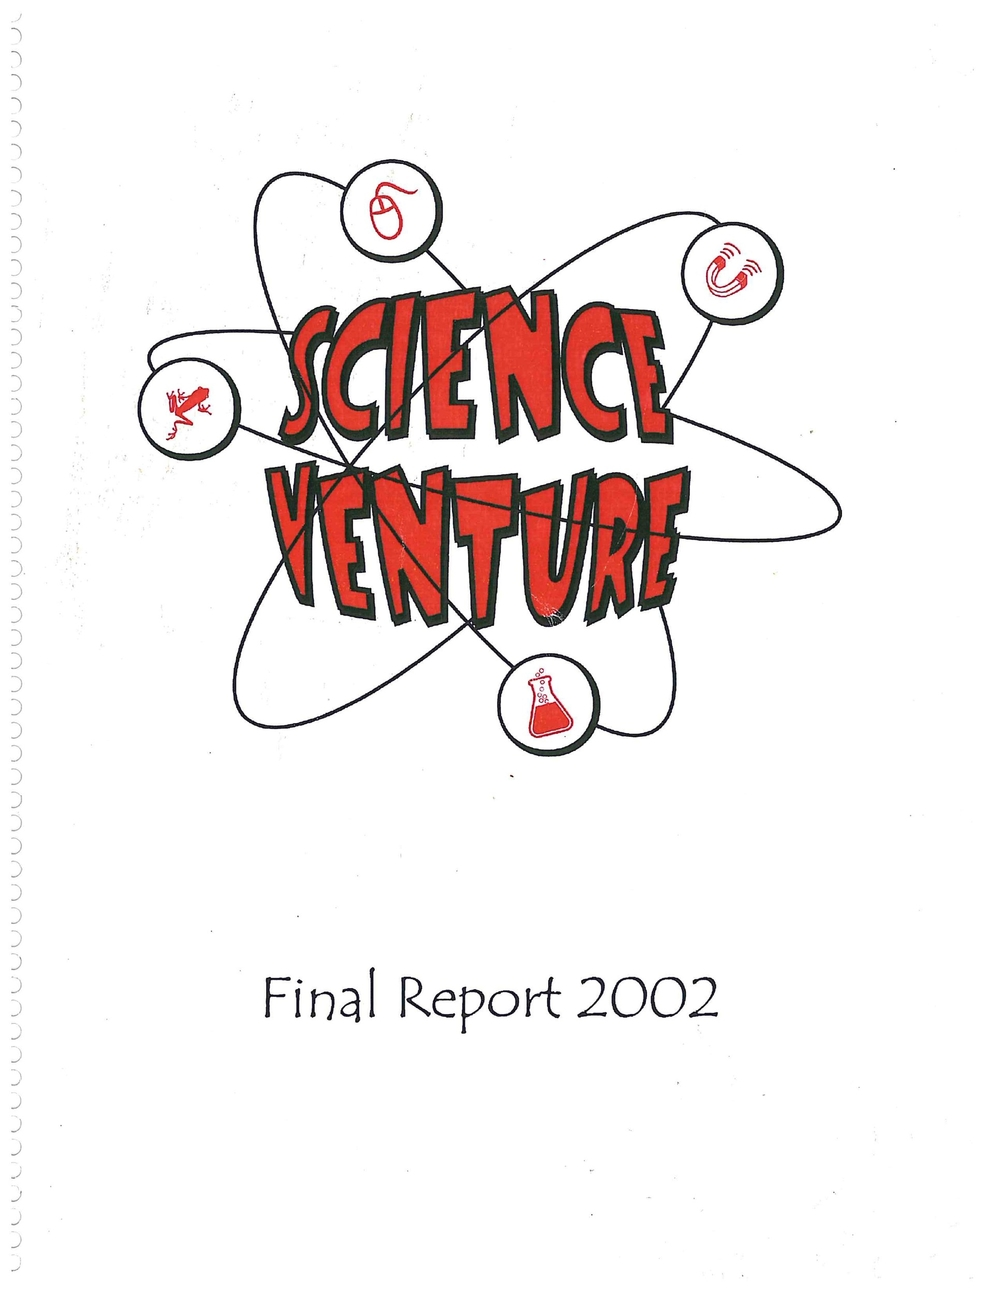 Final_Report_2002.jpg